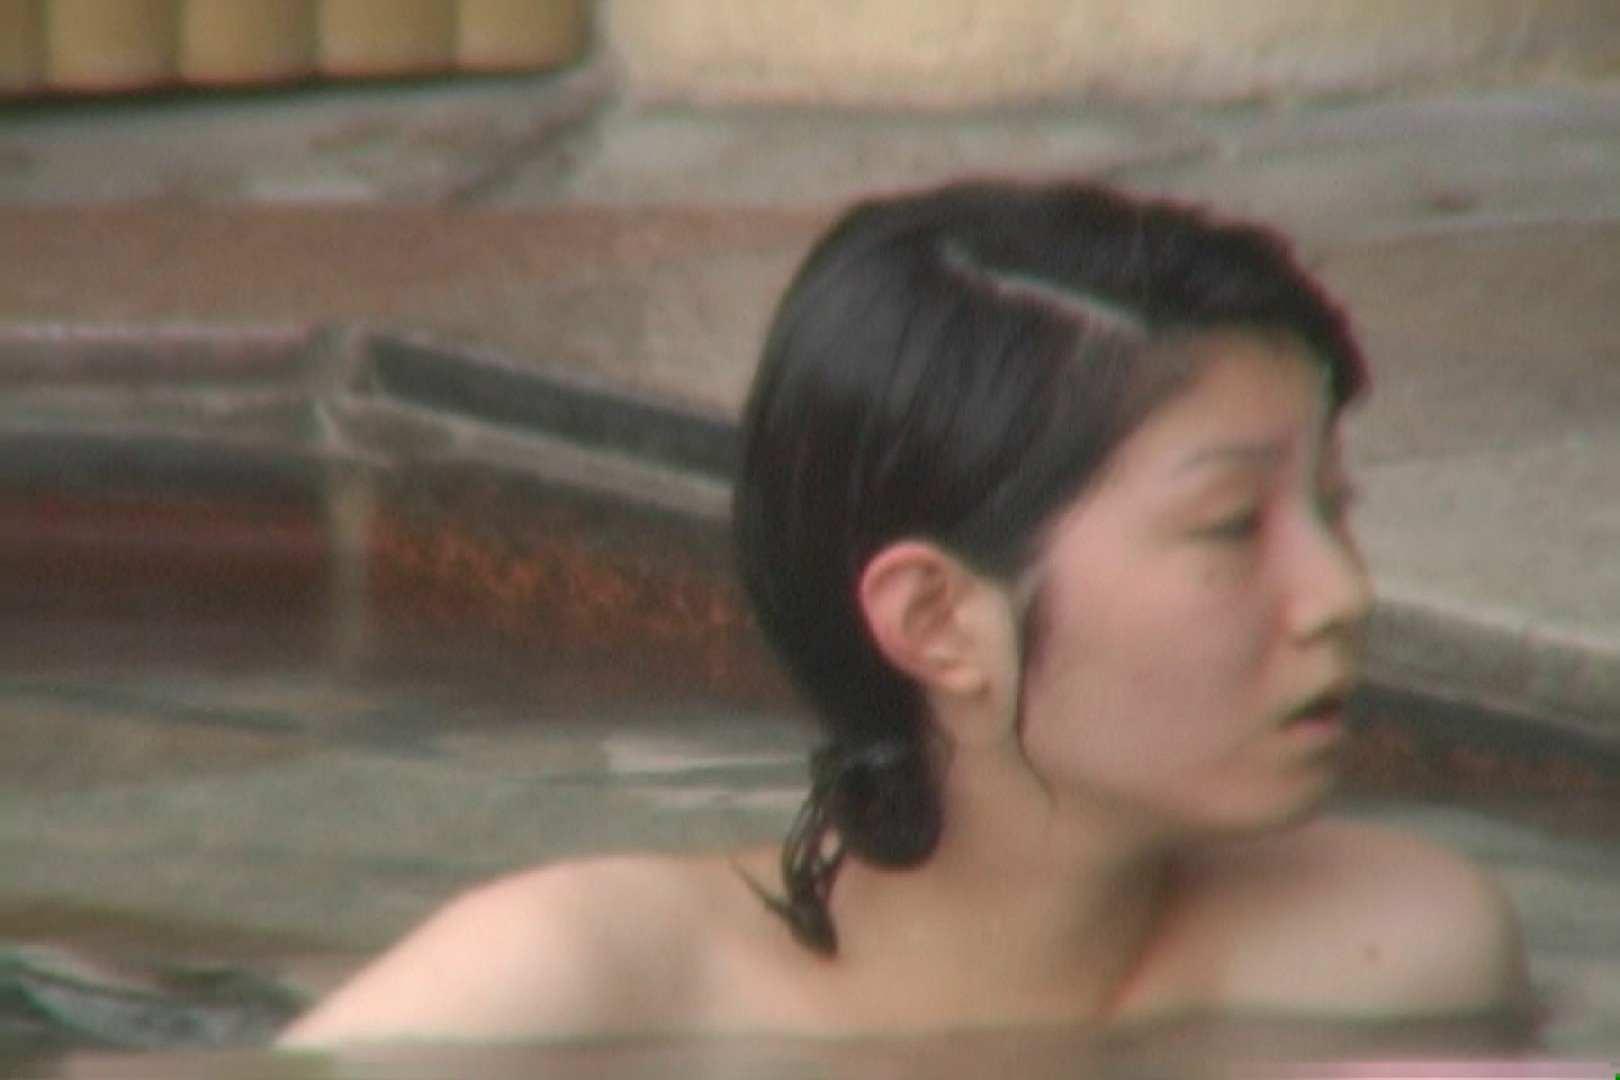 Aquaな露天風呂Vol.579 OL女体 | 露天  72連発 52